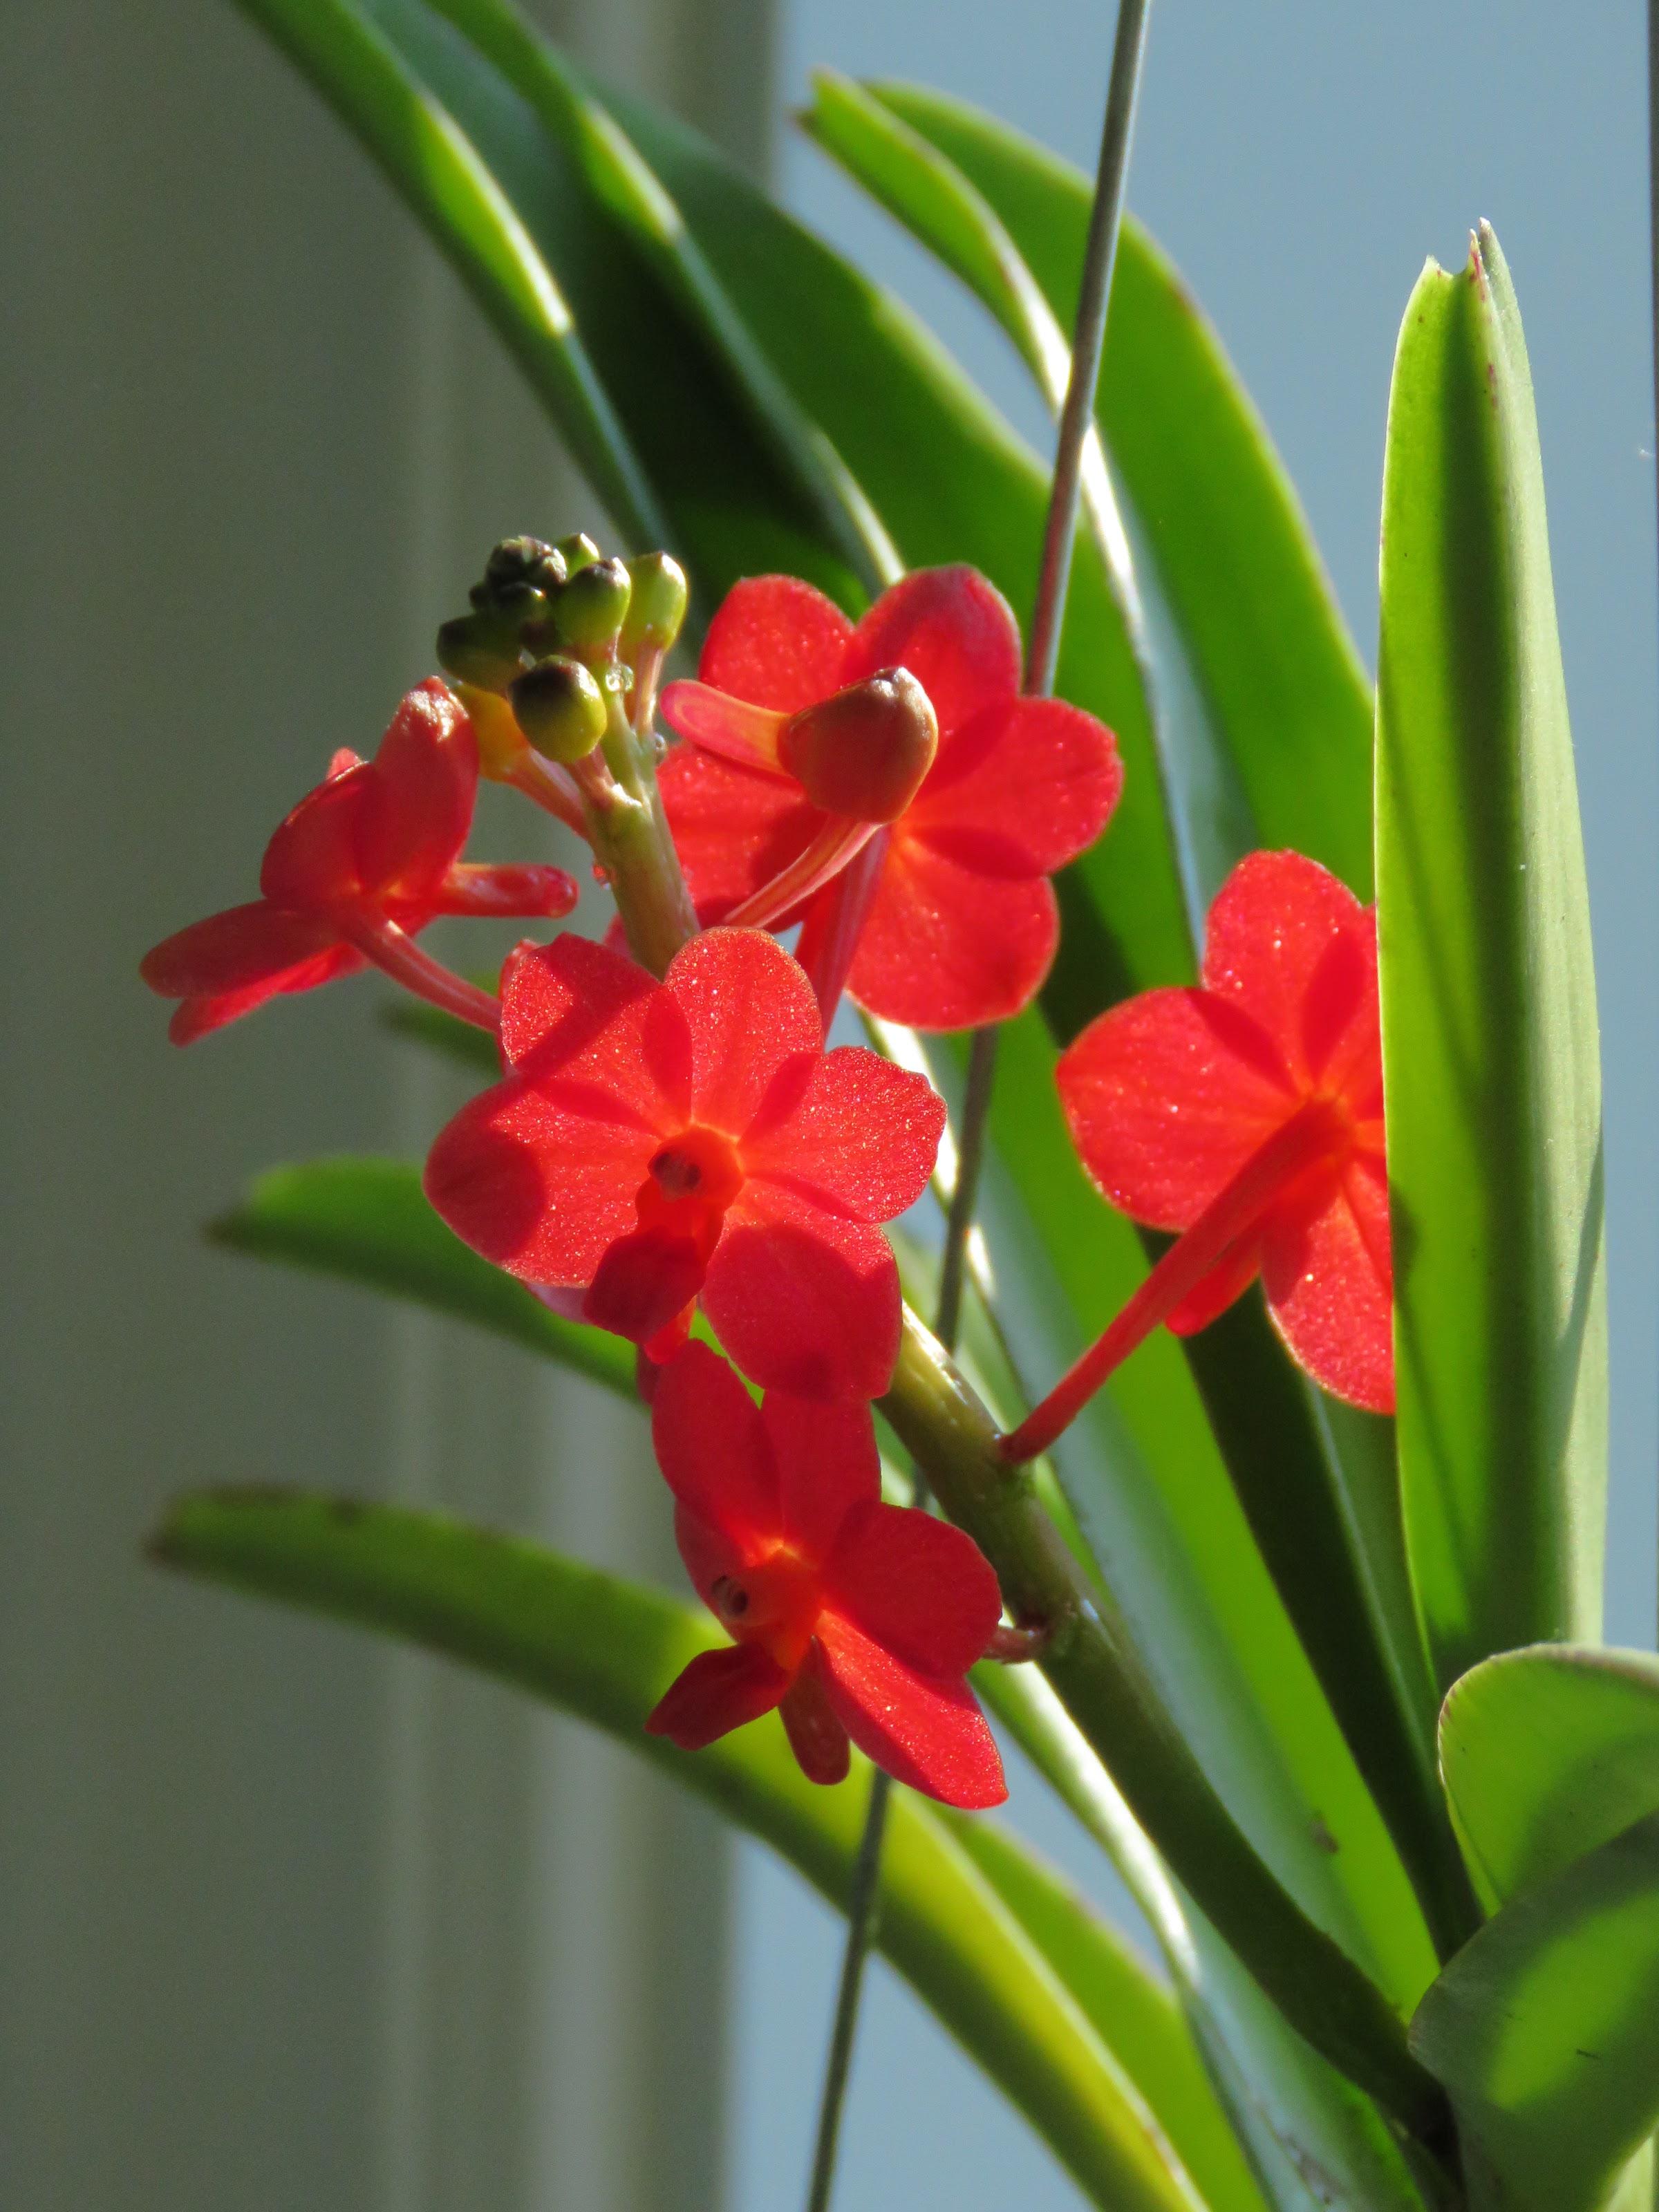 Les orchidées de Grigri - Page 11 X9bFQ9g0QiG_5GkTA28hbofqAg2-wF9GUFpy5_CH4P9j5GpTLML8LpYm8NJR-jkiwtXydXOZXmrtknLxzXALhI_EI05zIQnU1pAzNXRvcepTwn2k87rt8DUzxkKI45LeNW9GVDBjm8Q=w2400